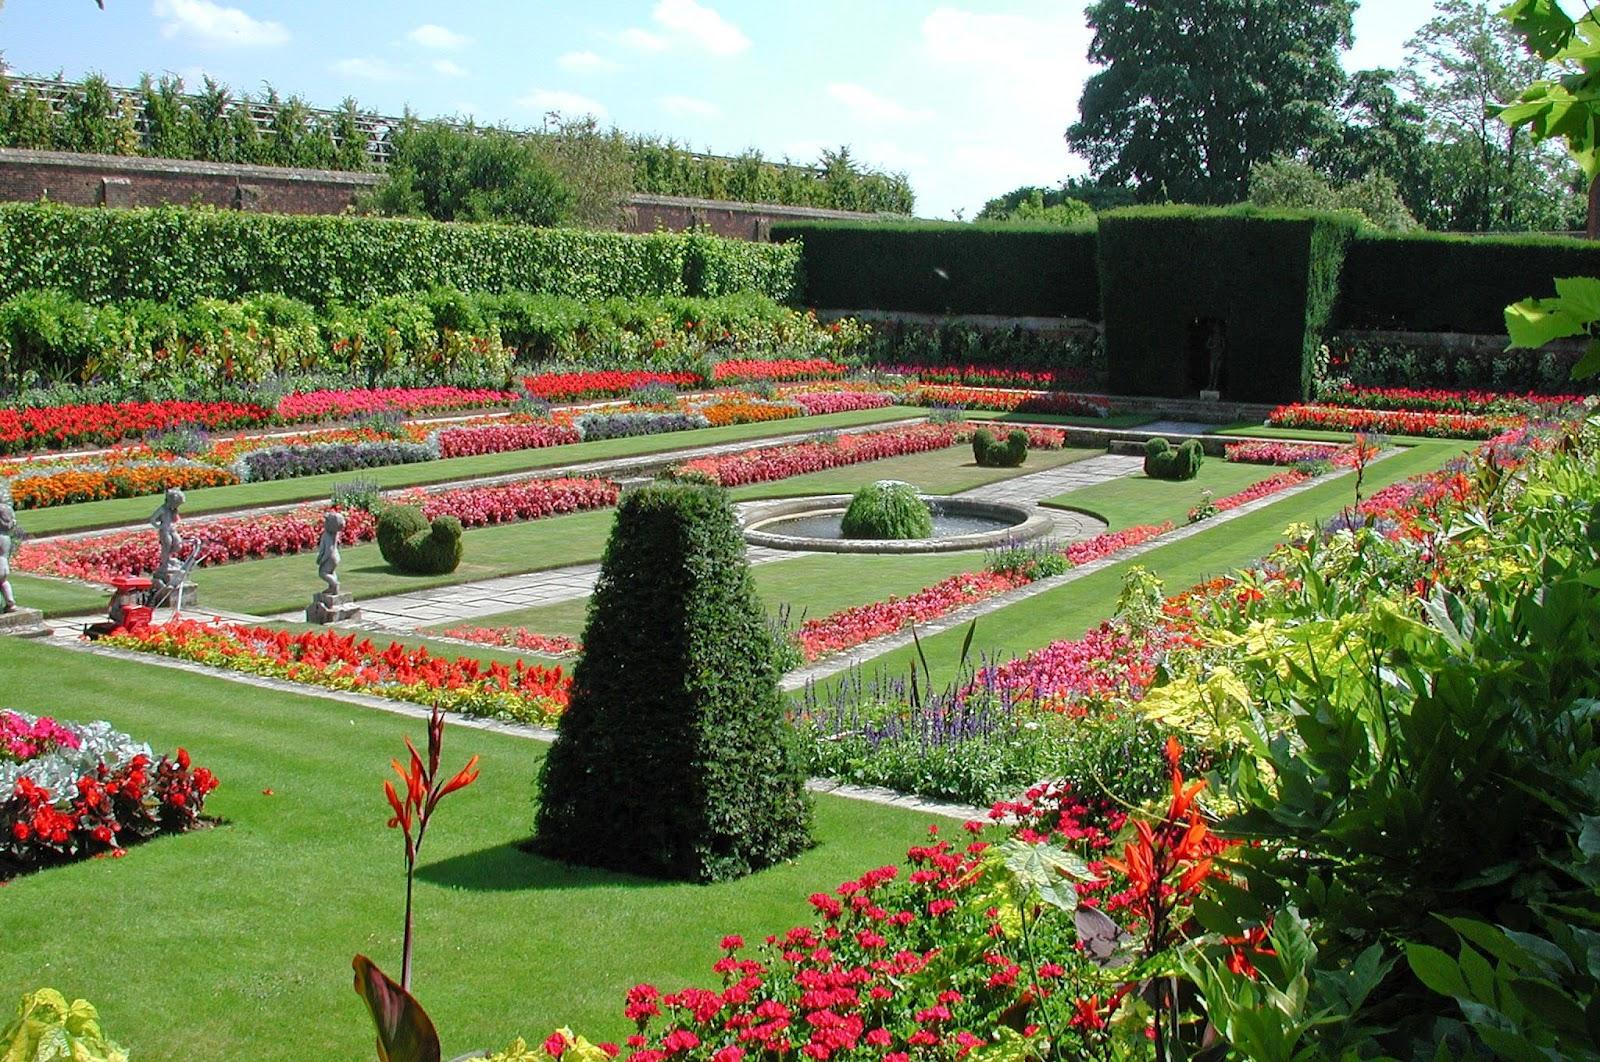 Roses In Garden: Garden History Matters: The Tudor Garden